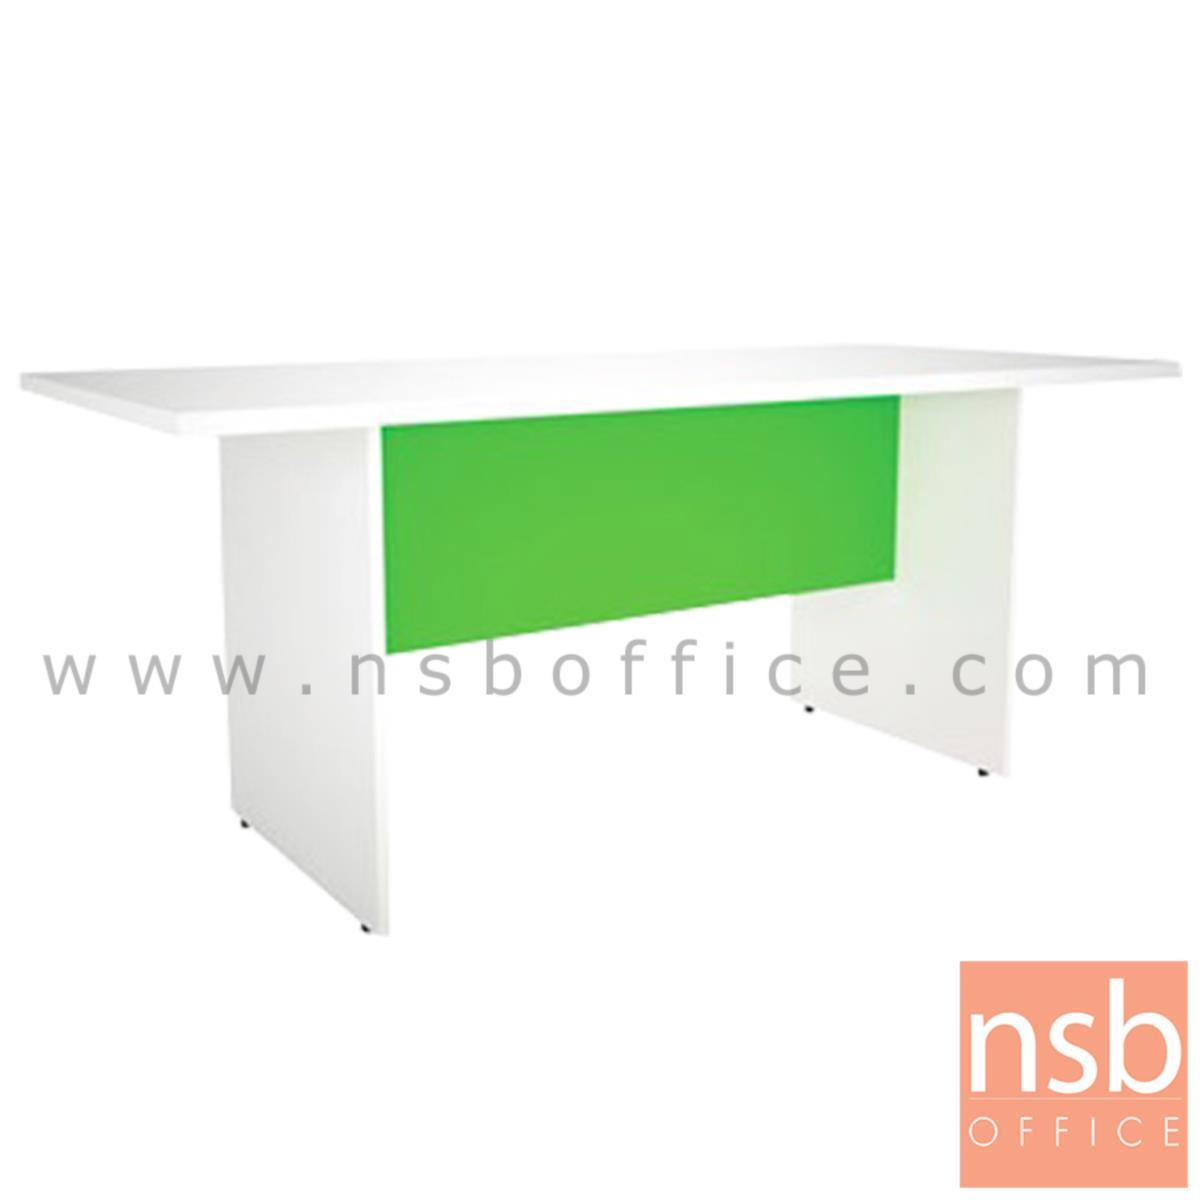 A20A021:โต๊ะประชุมสีสัน  รุ่น Aroma (อโลมา) ขนาด 180W cm.